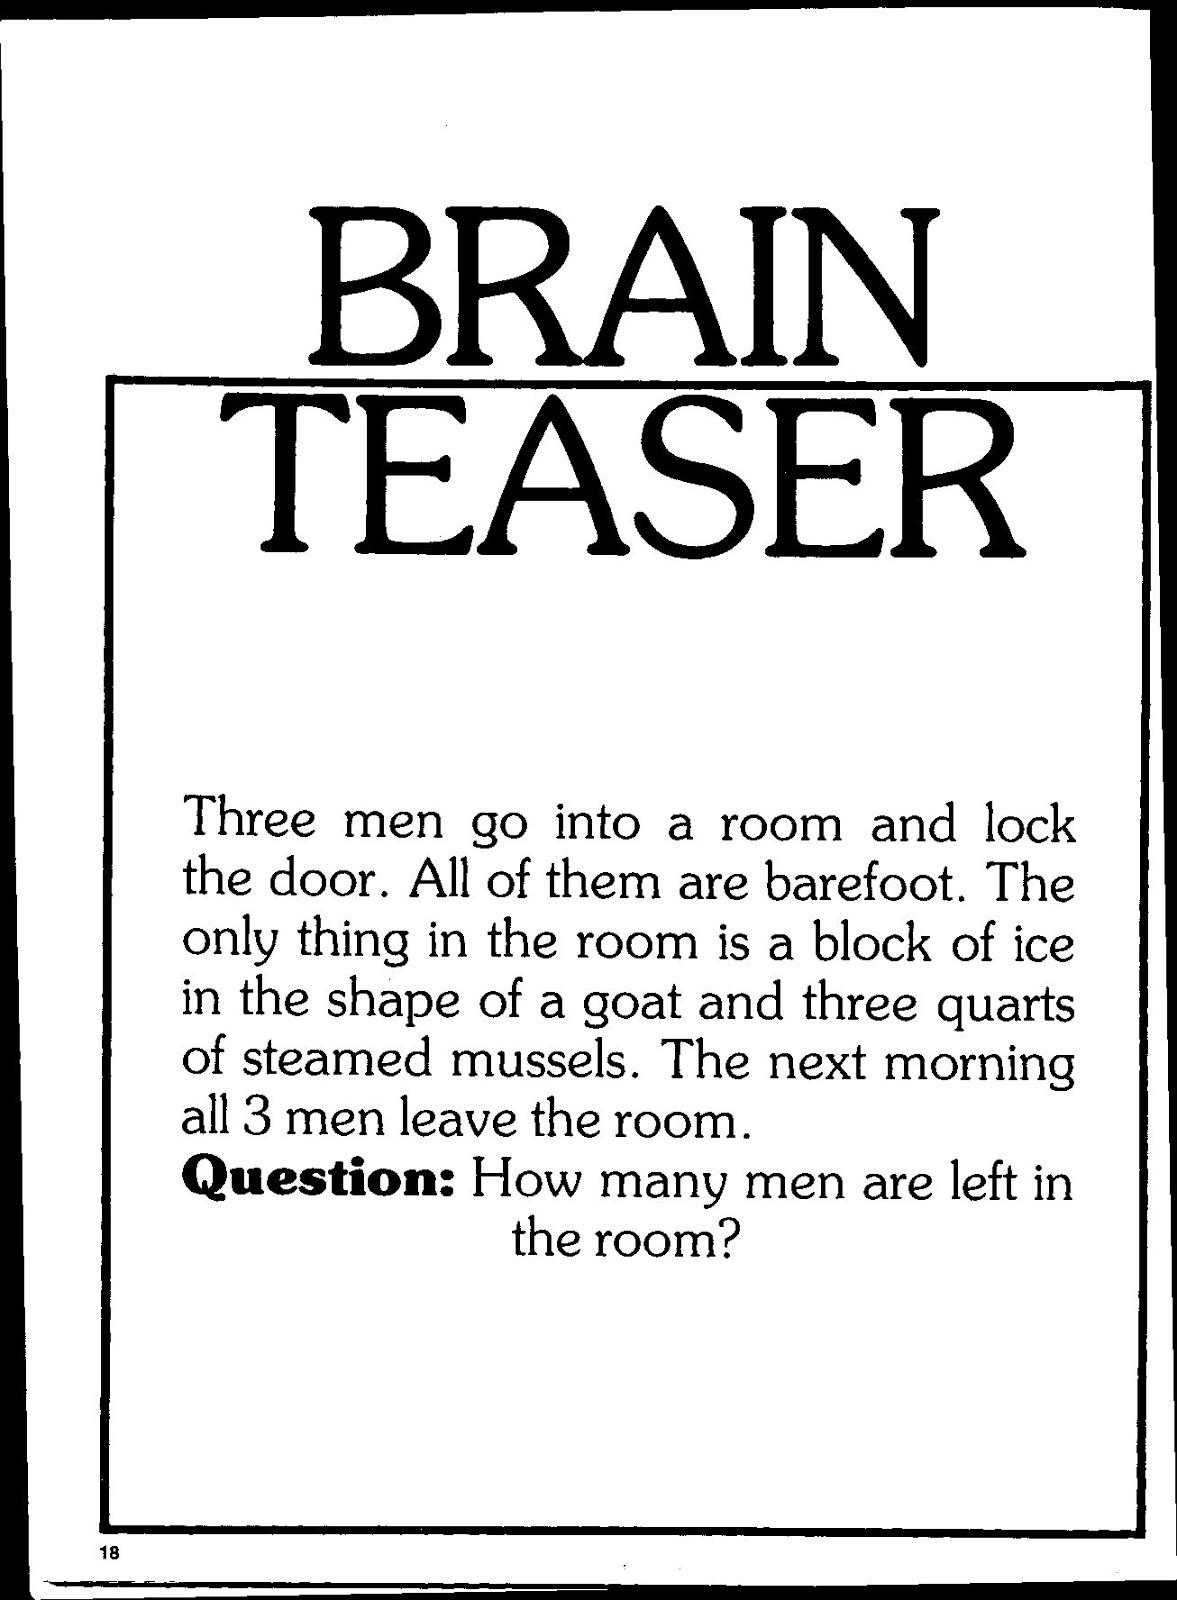 Brain Teaser - Free Online Game - Play Now | Kizi